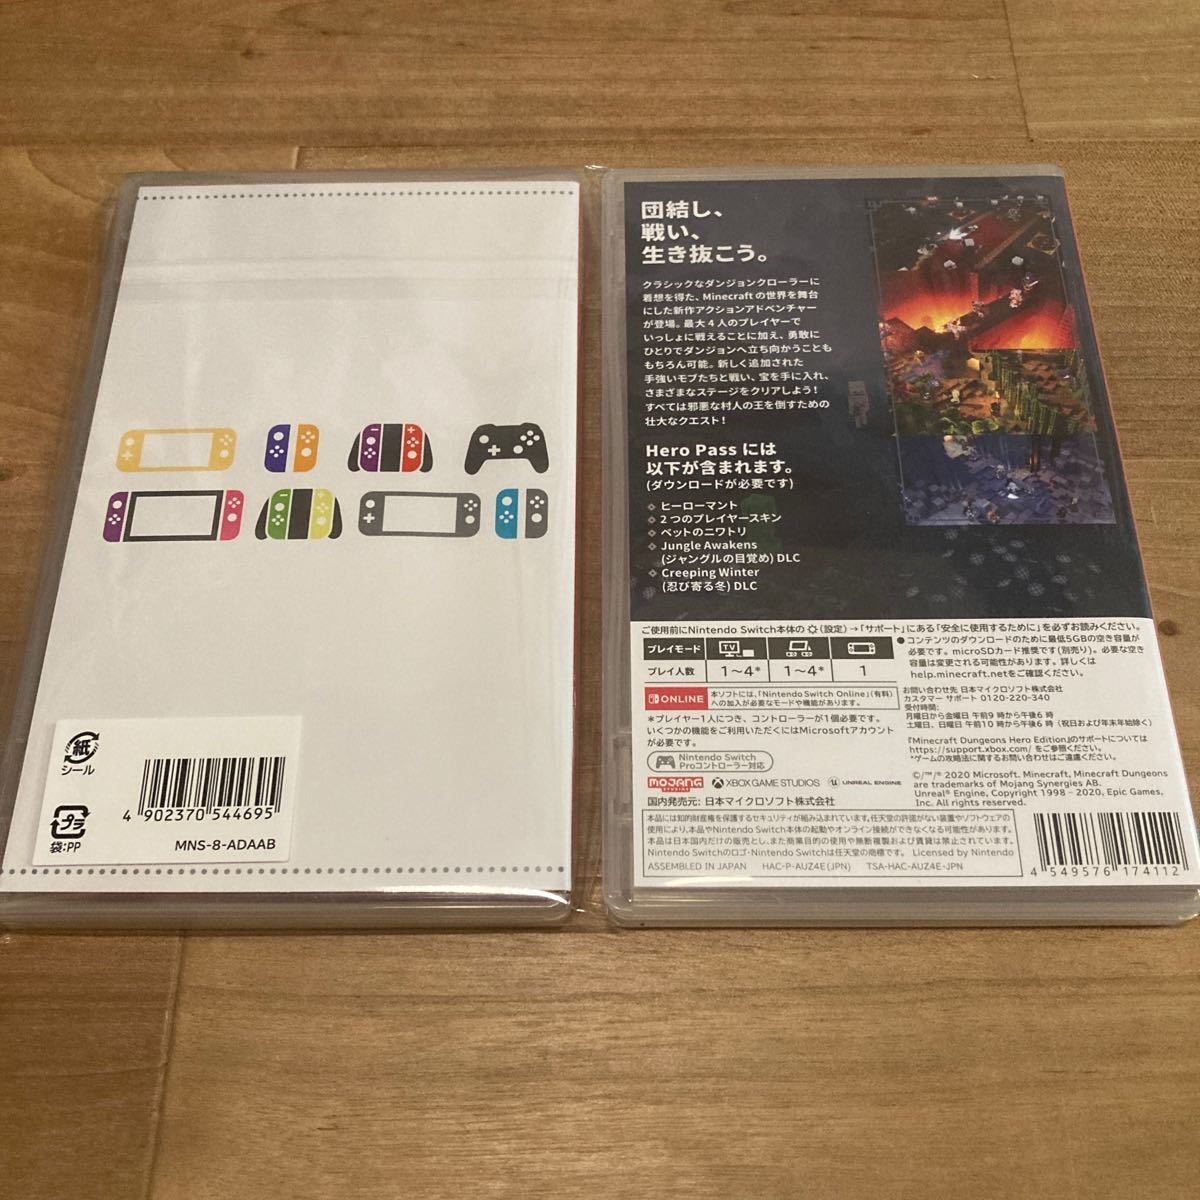 Switchソフト マインクラフトダンジョンズ Nintendo Switch Card case8